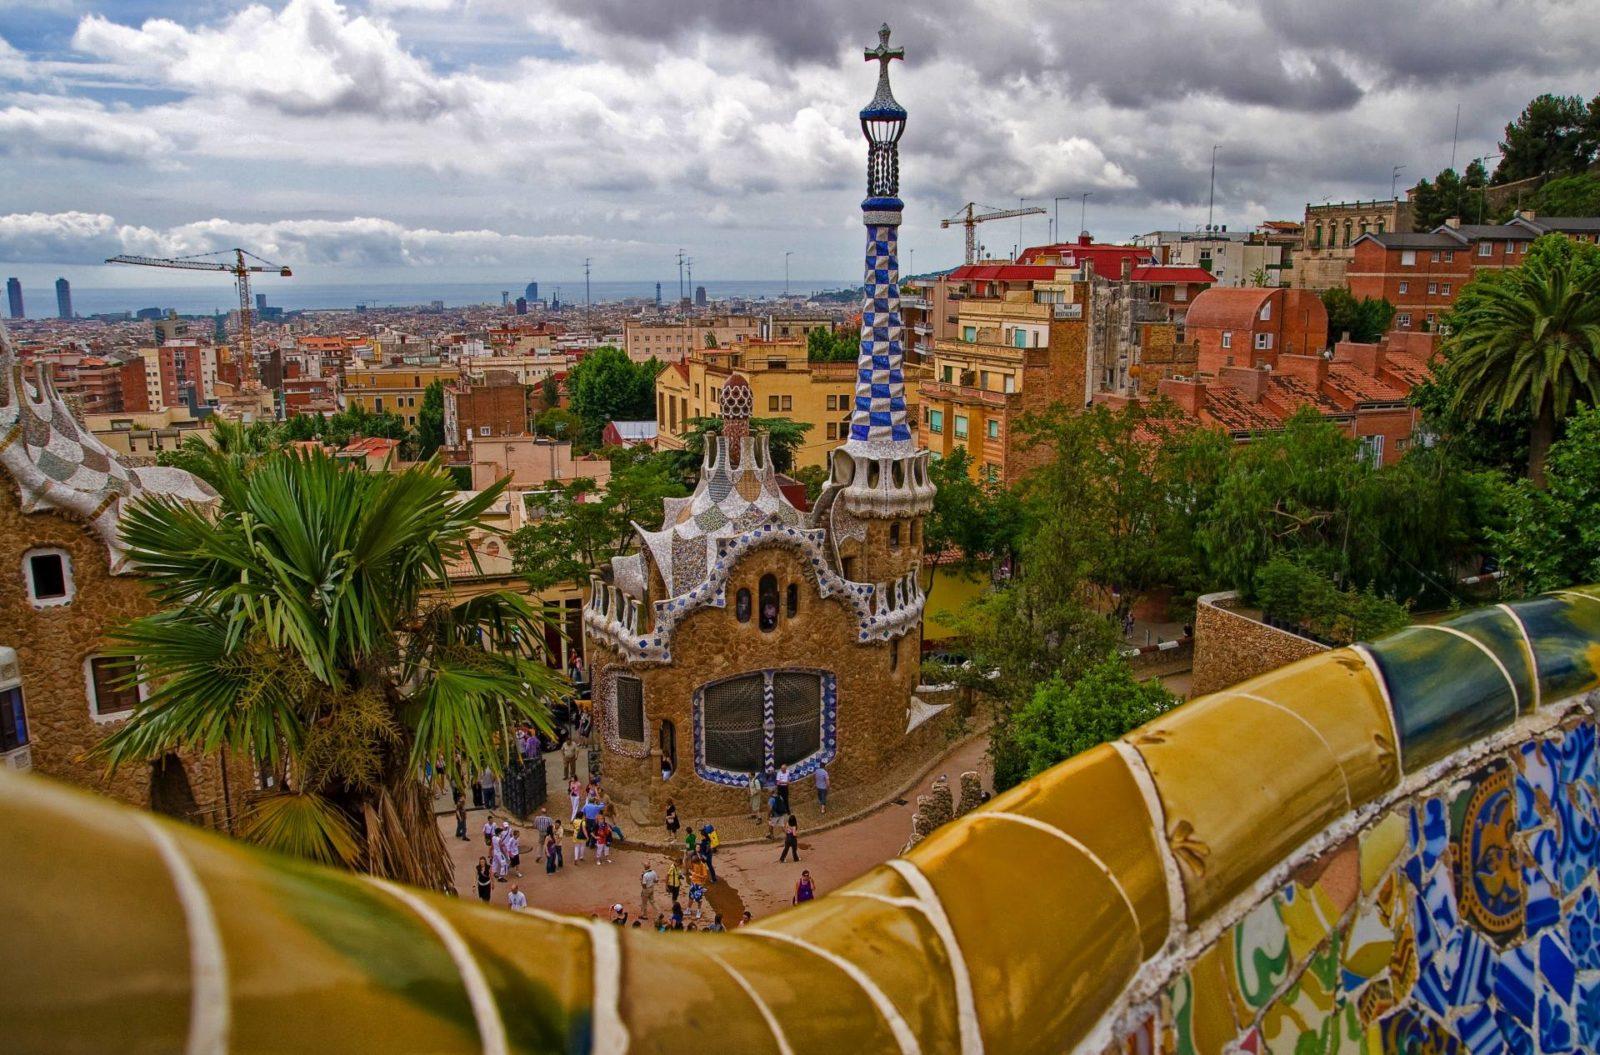 Bareclona Spain